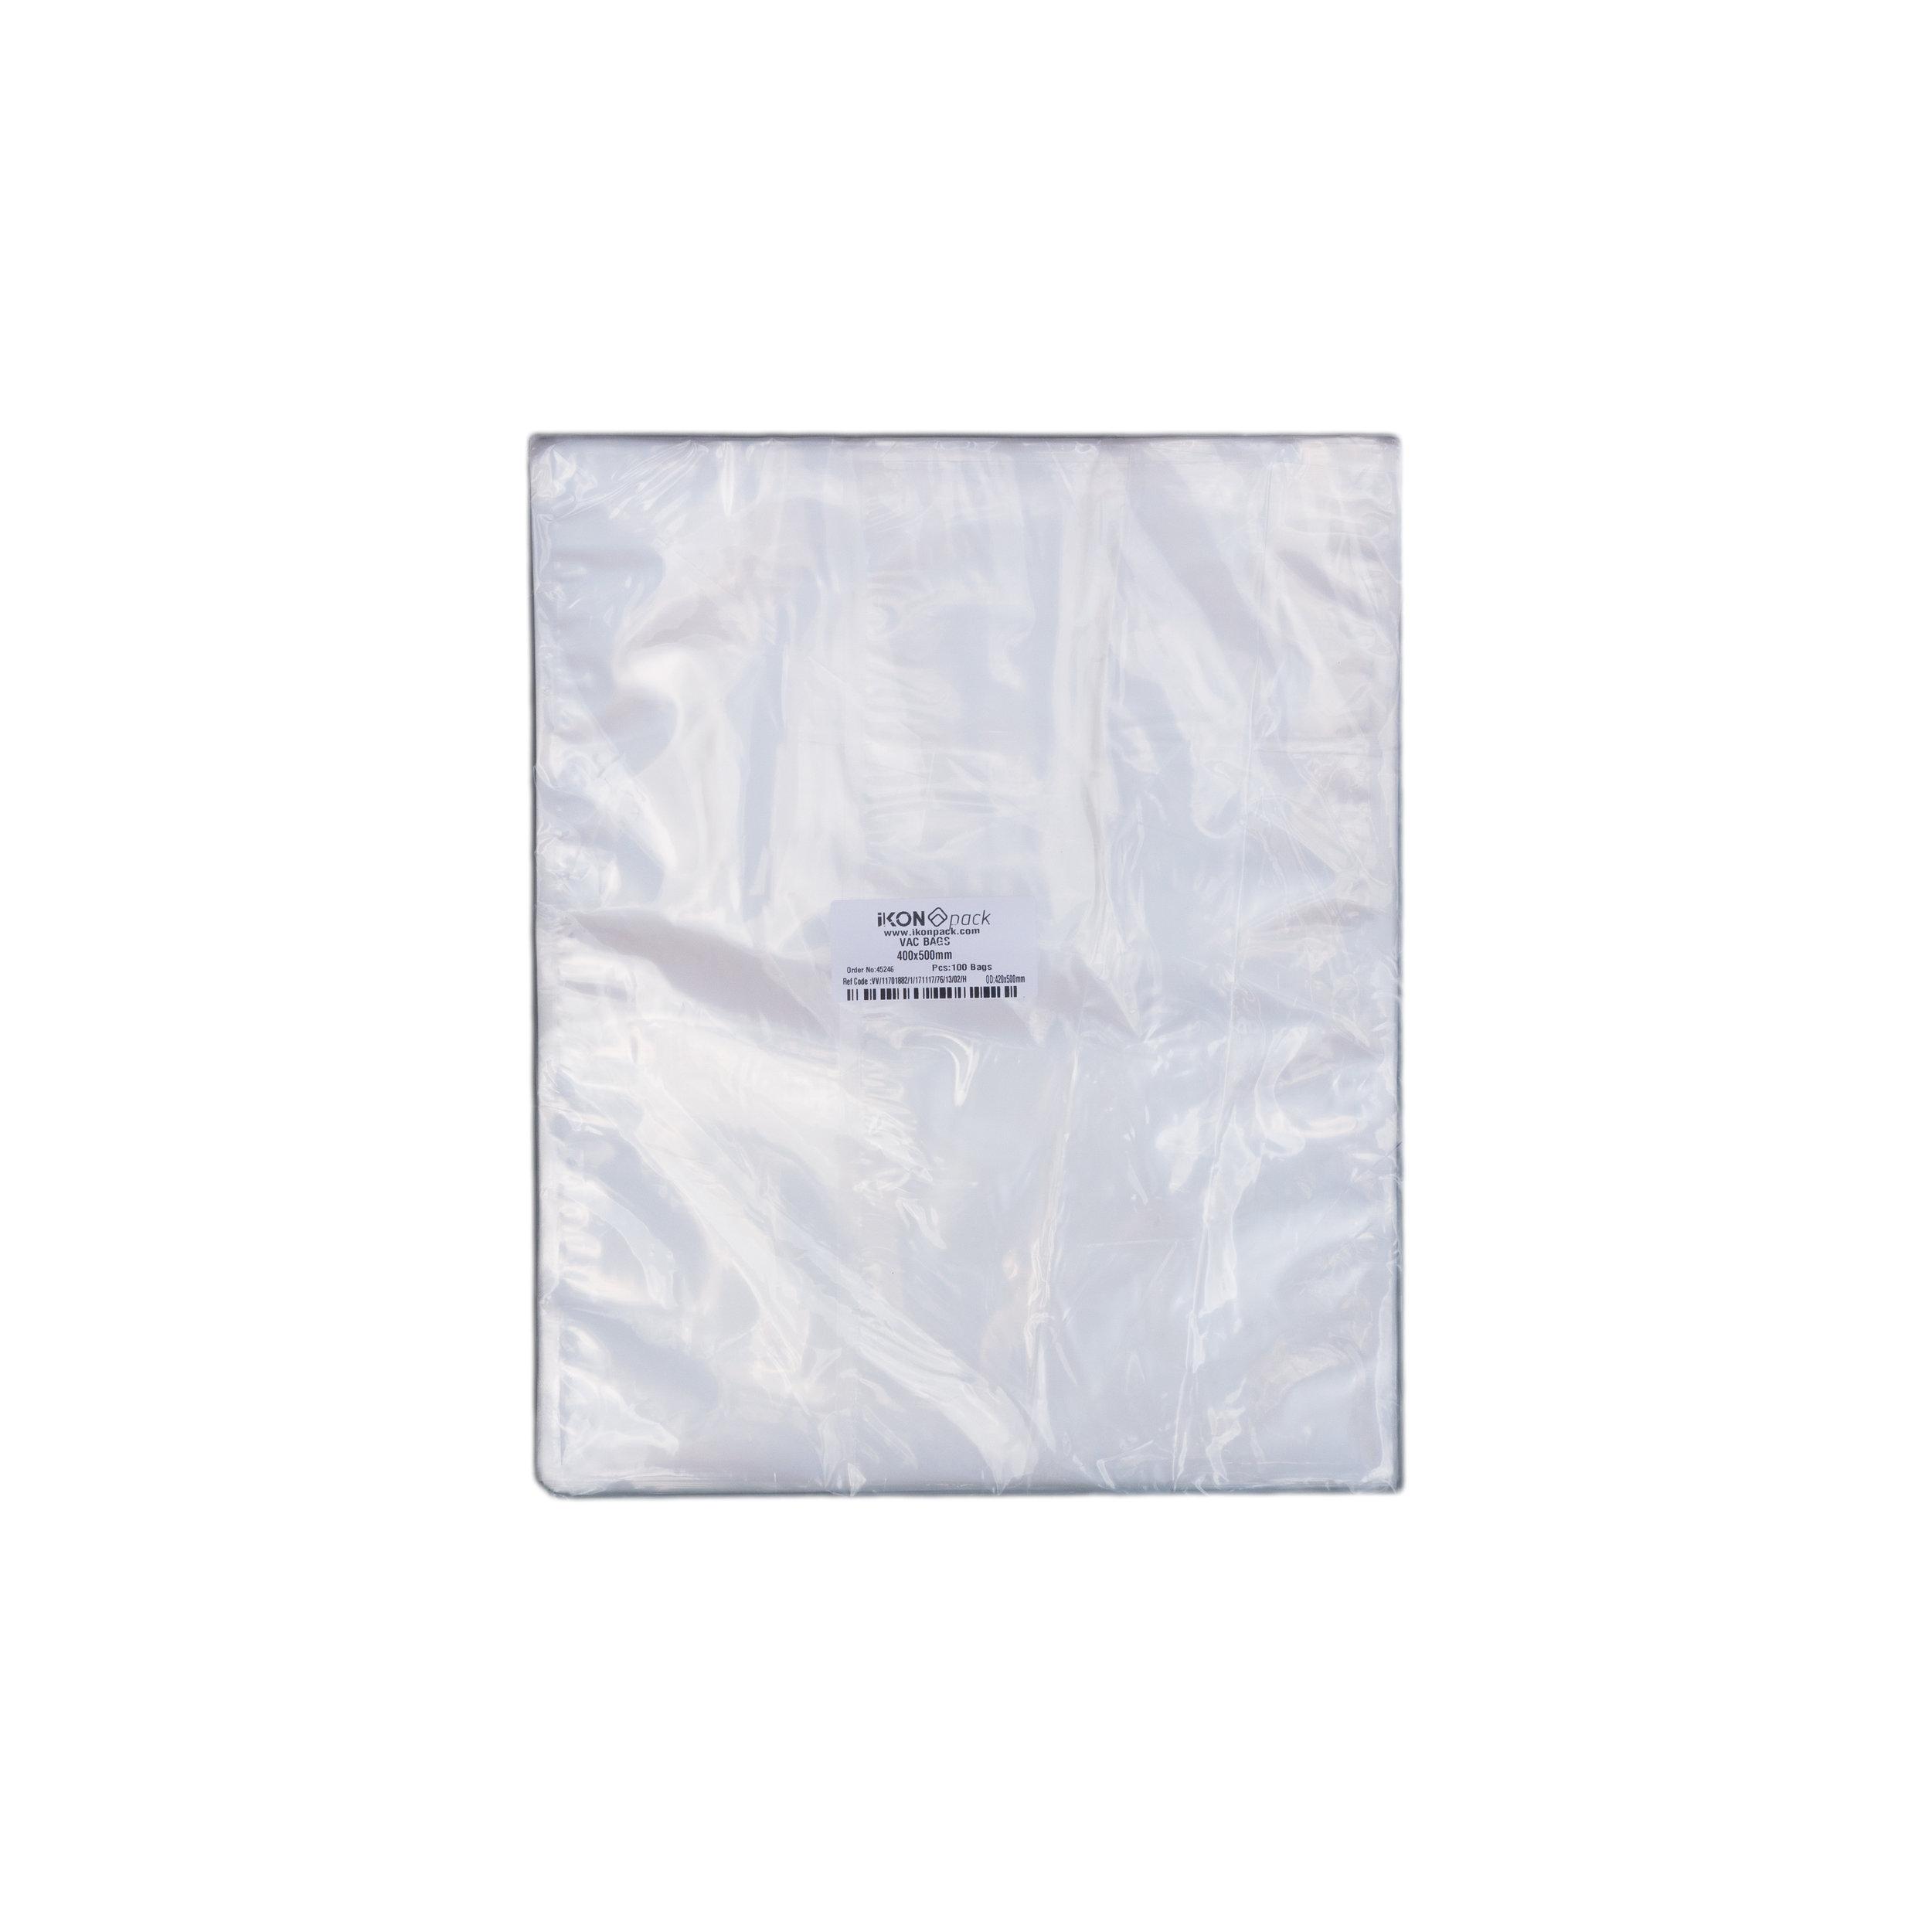 iK-VAC4050      VACUUM POUCH 70 MICRON 400X500    100 per slv 500 per carton